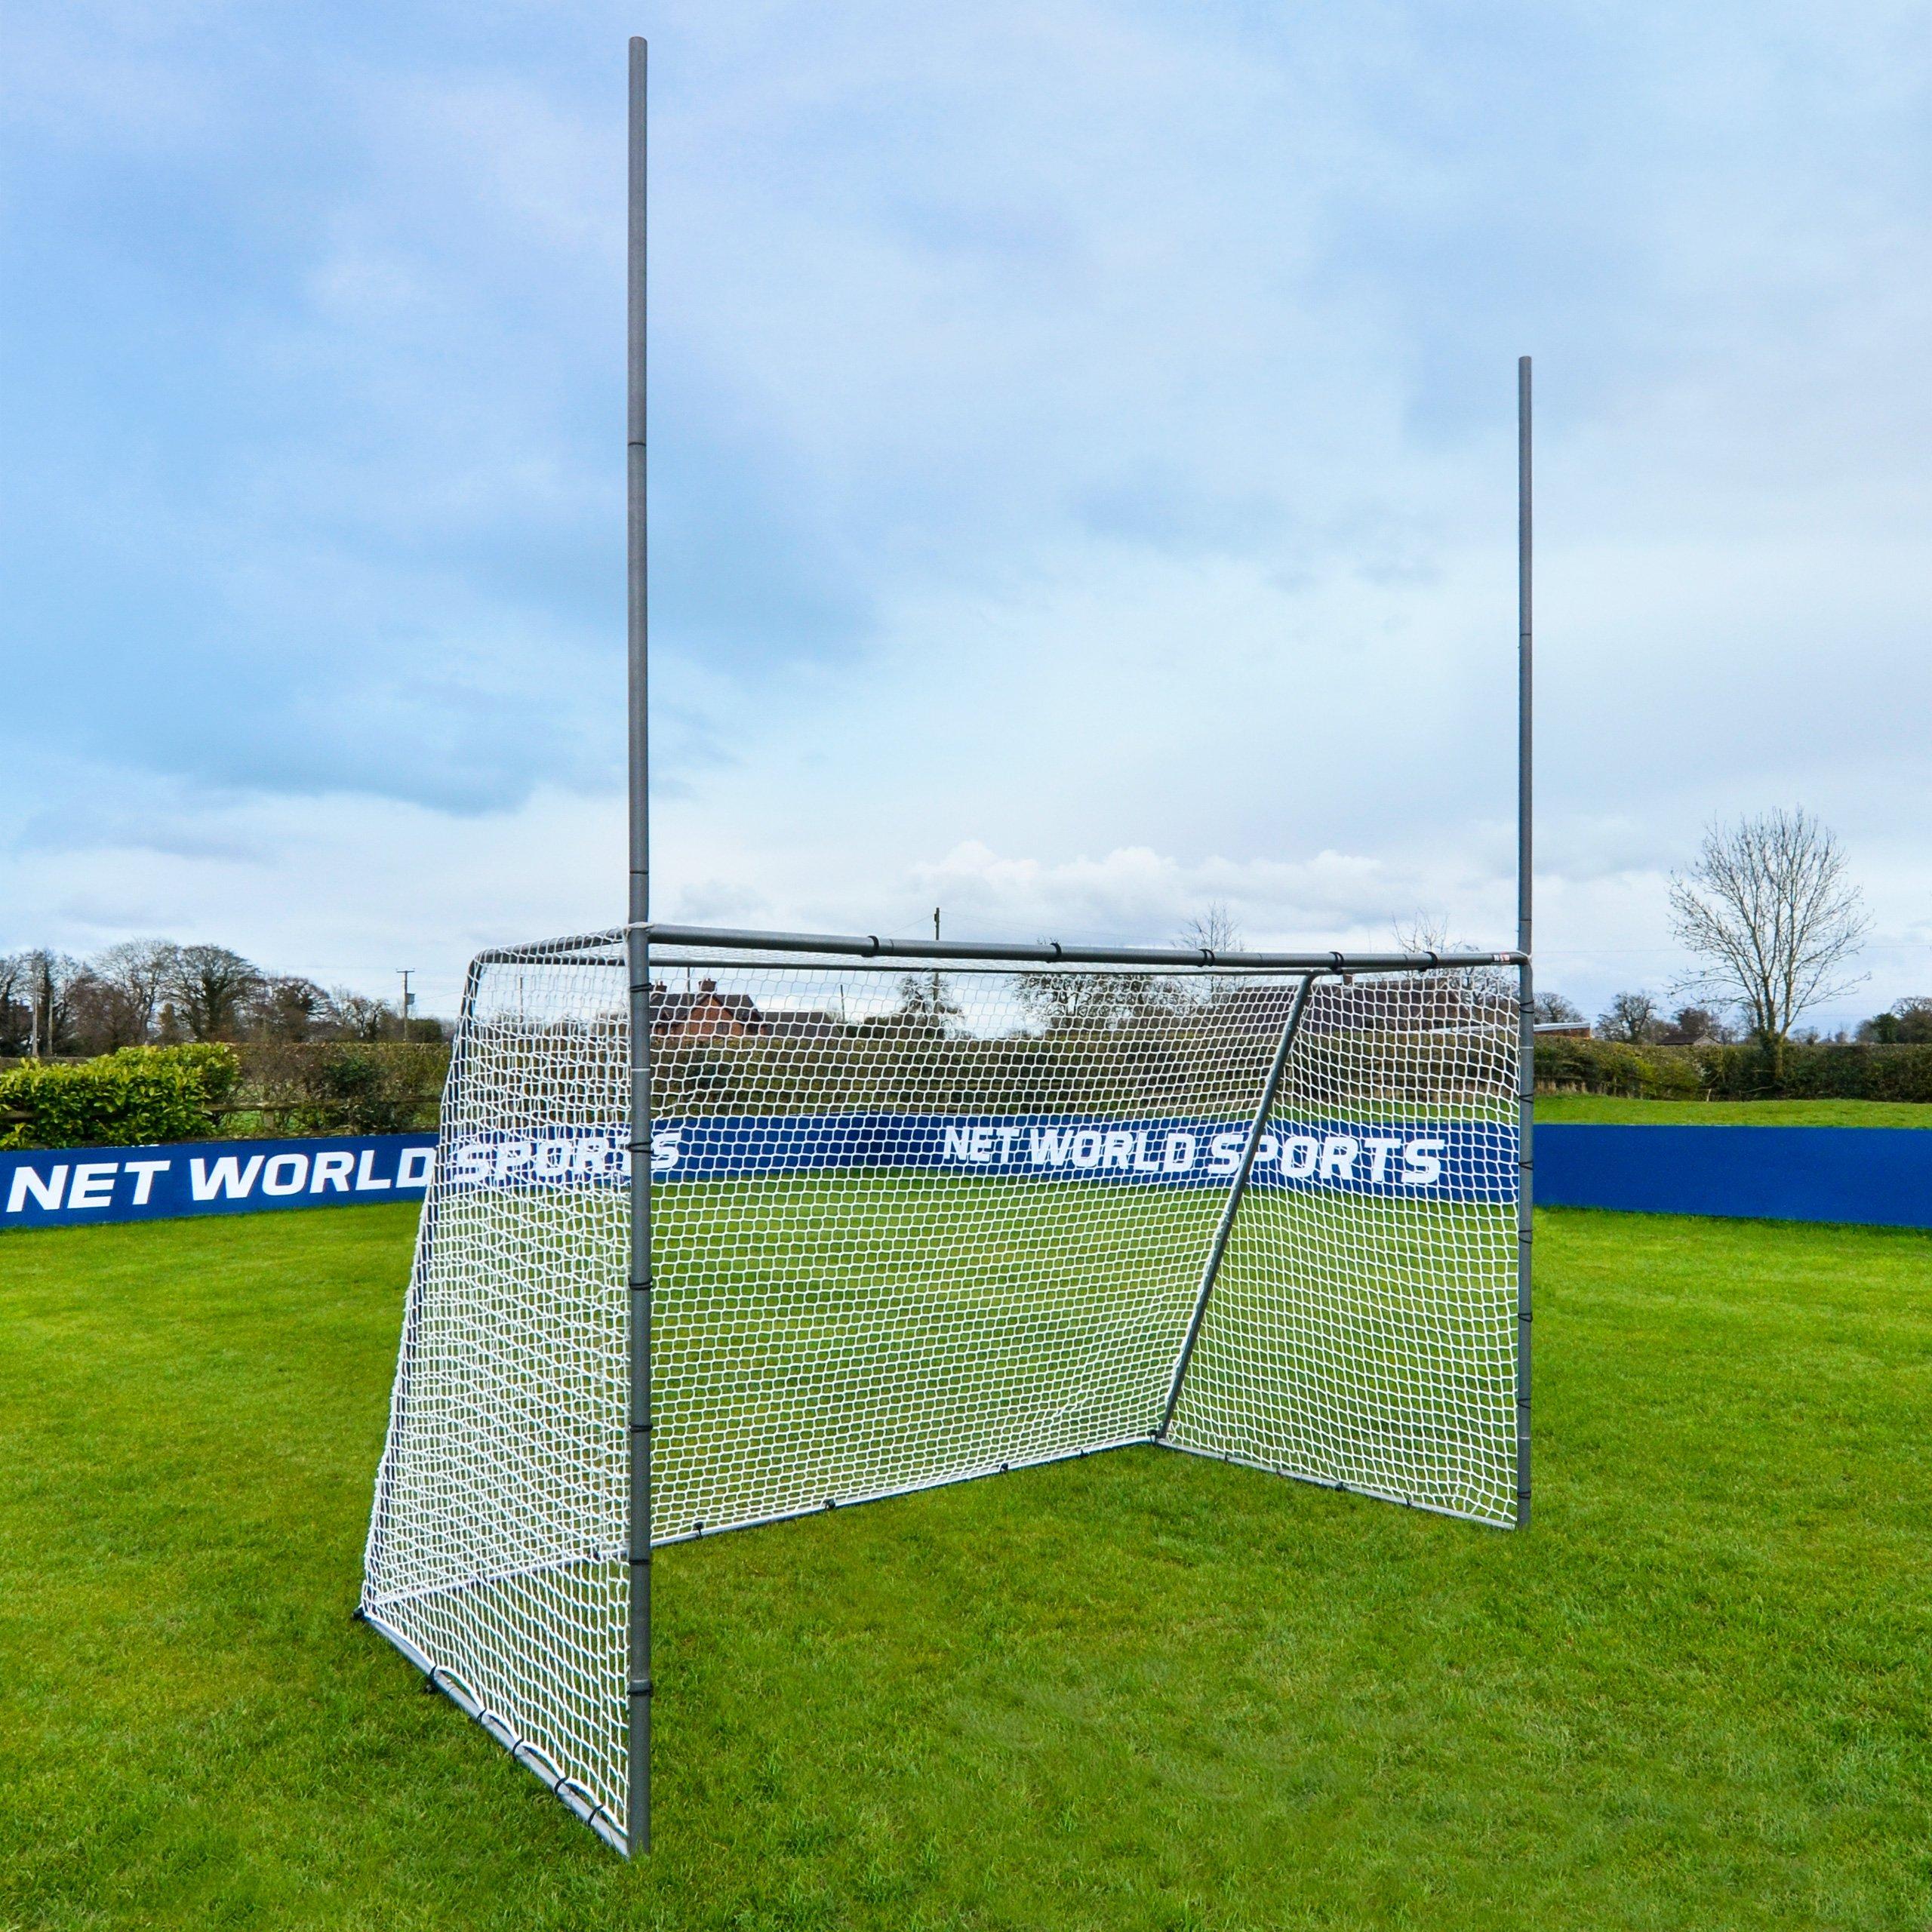 Net World Sports Forza Steel42 Football/Soccer Combination Goal Posts - Super Strong Steel Goals for The Backyard (10ft x 6ft)